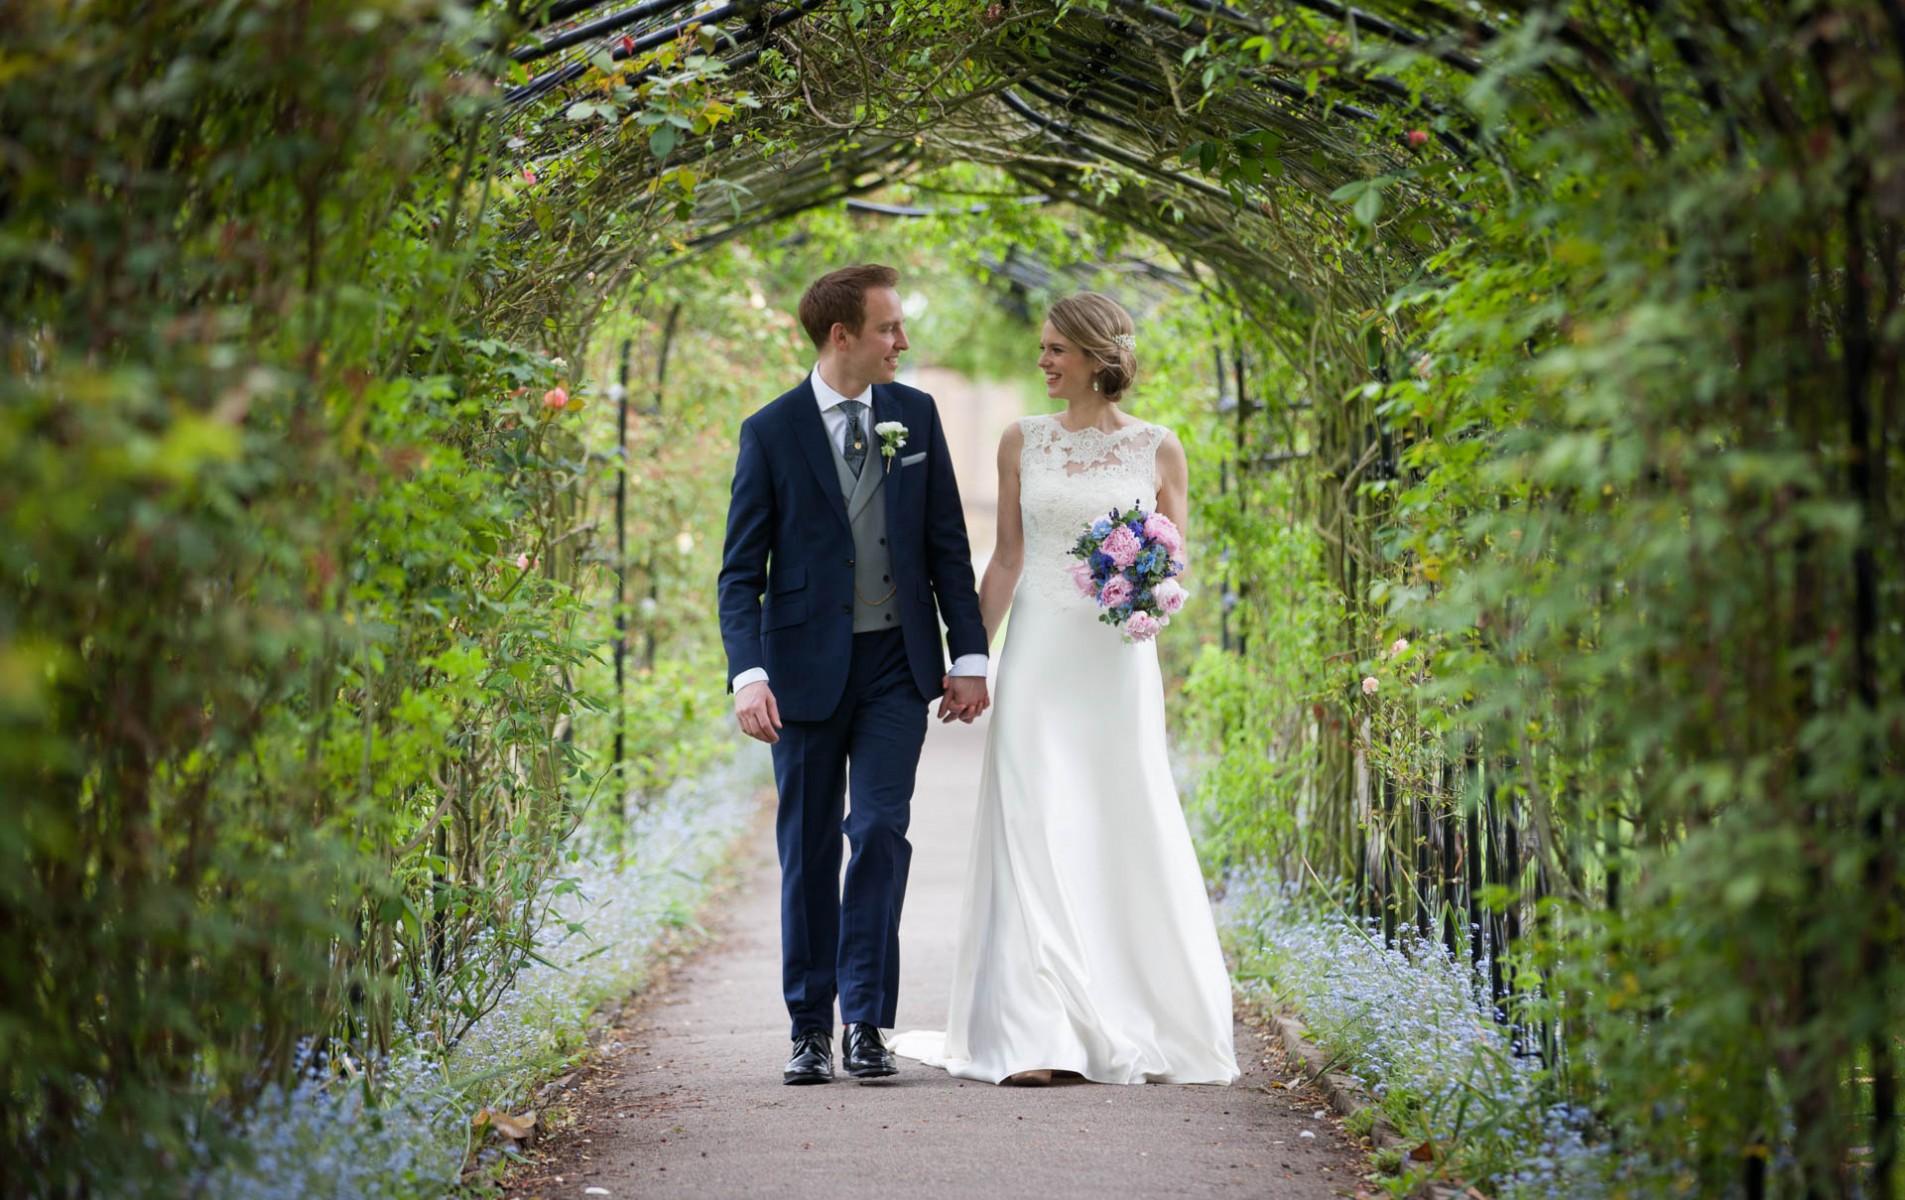 Nonsuch Mansion Wedding - Caroline and Paul